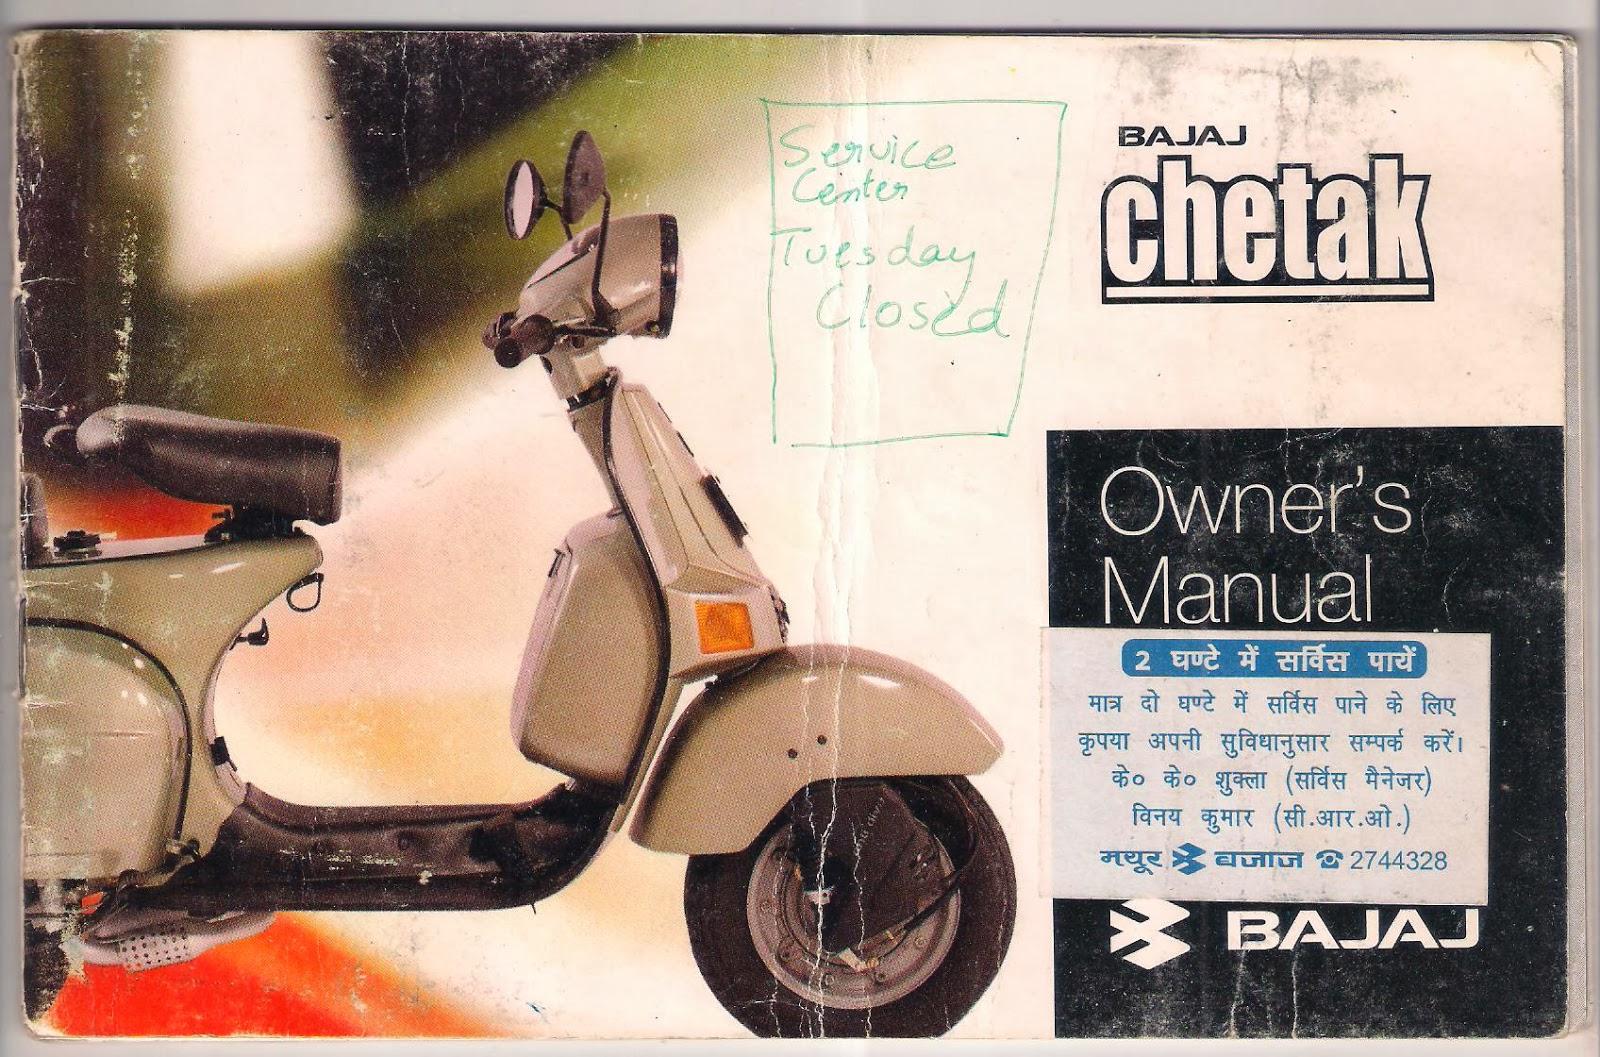 rare motorcycle bajaj chetak 2005 model owners manual rh oldraremotorcycles blogspot com Alouette Cheetak Alouette Cheetak